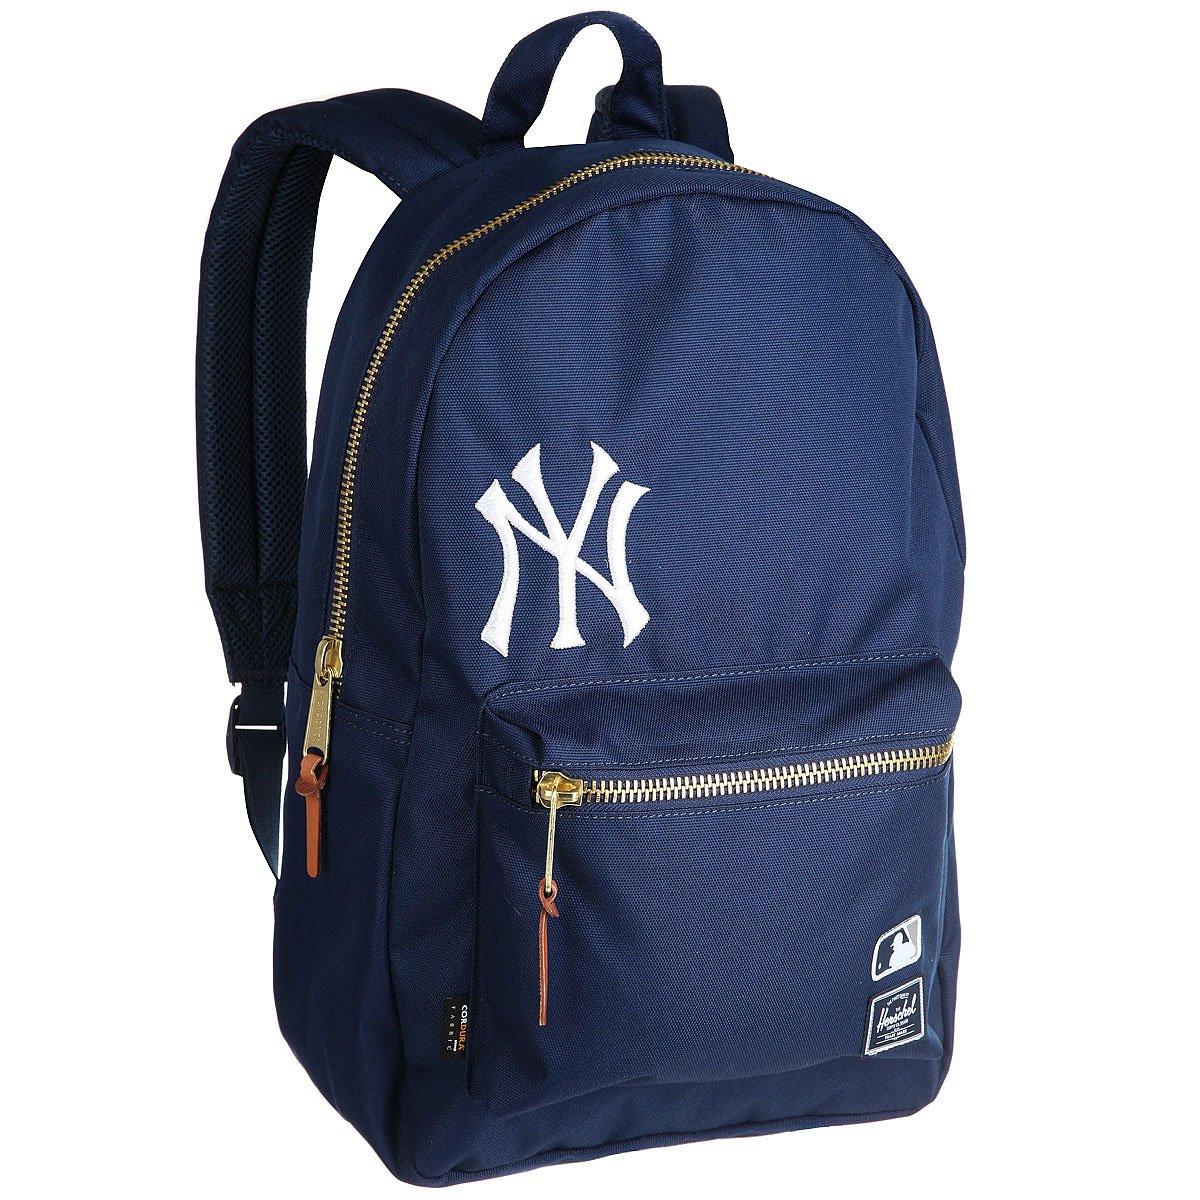 a5327ccb44 Купить рюкзак городской Herschel Settlement New York Yankees в ...